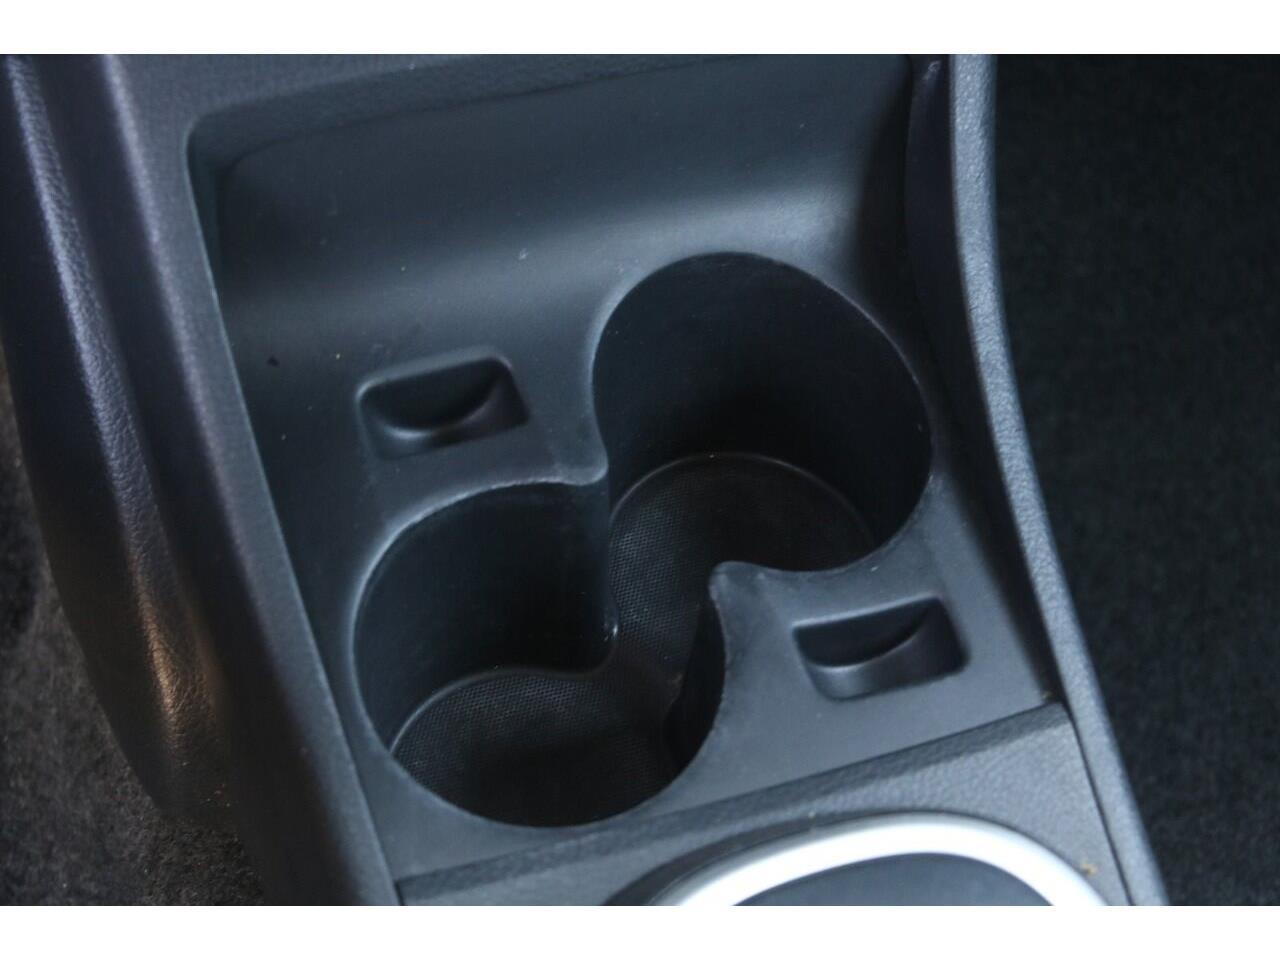 2009 Nissan Versa (CC-1310518) for sale in Dinuba, California